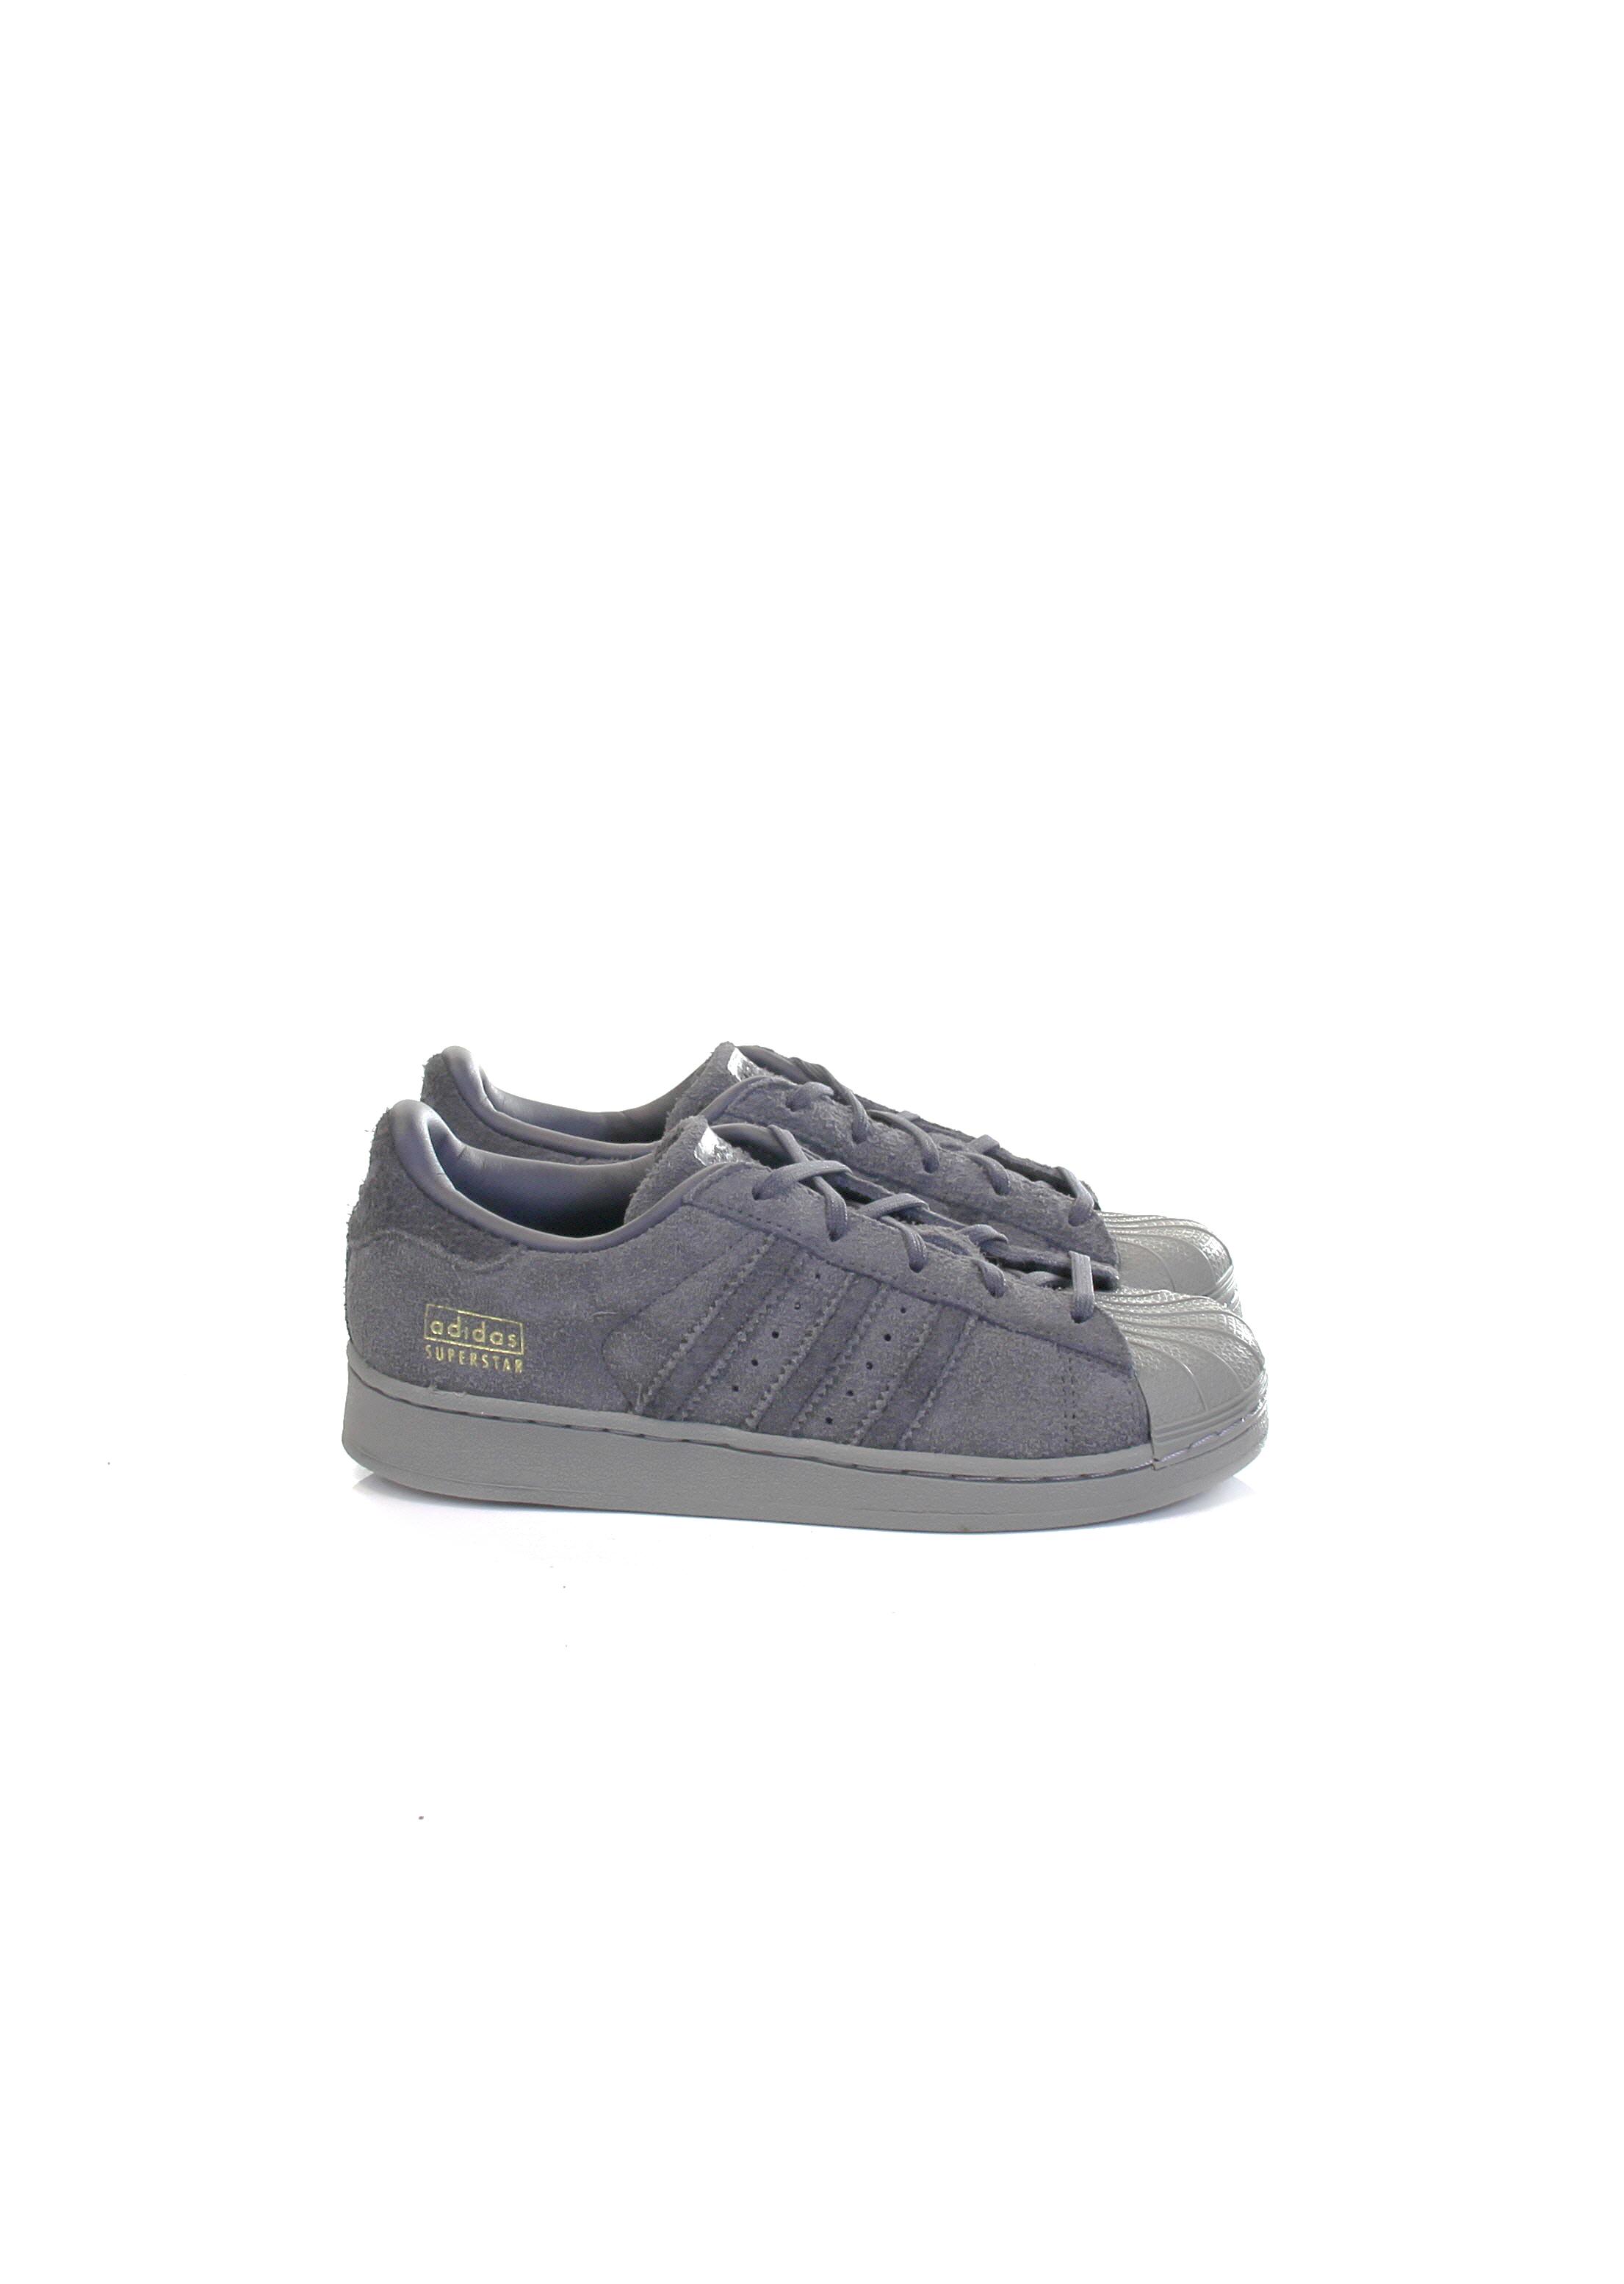 hot sale online 2748e 4c7c8 Adidas Superstar   Adidas Superstar sale